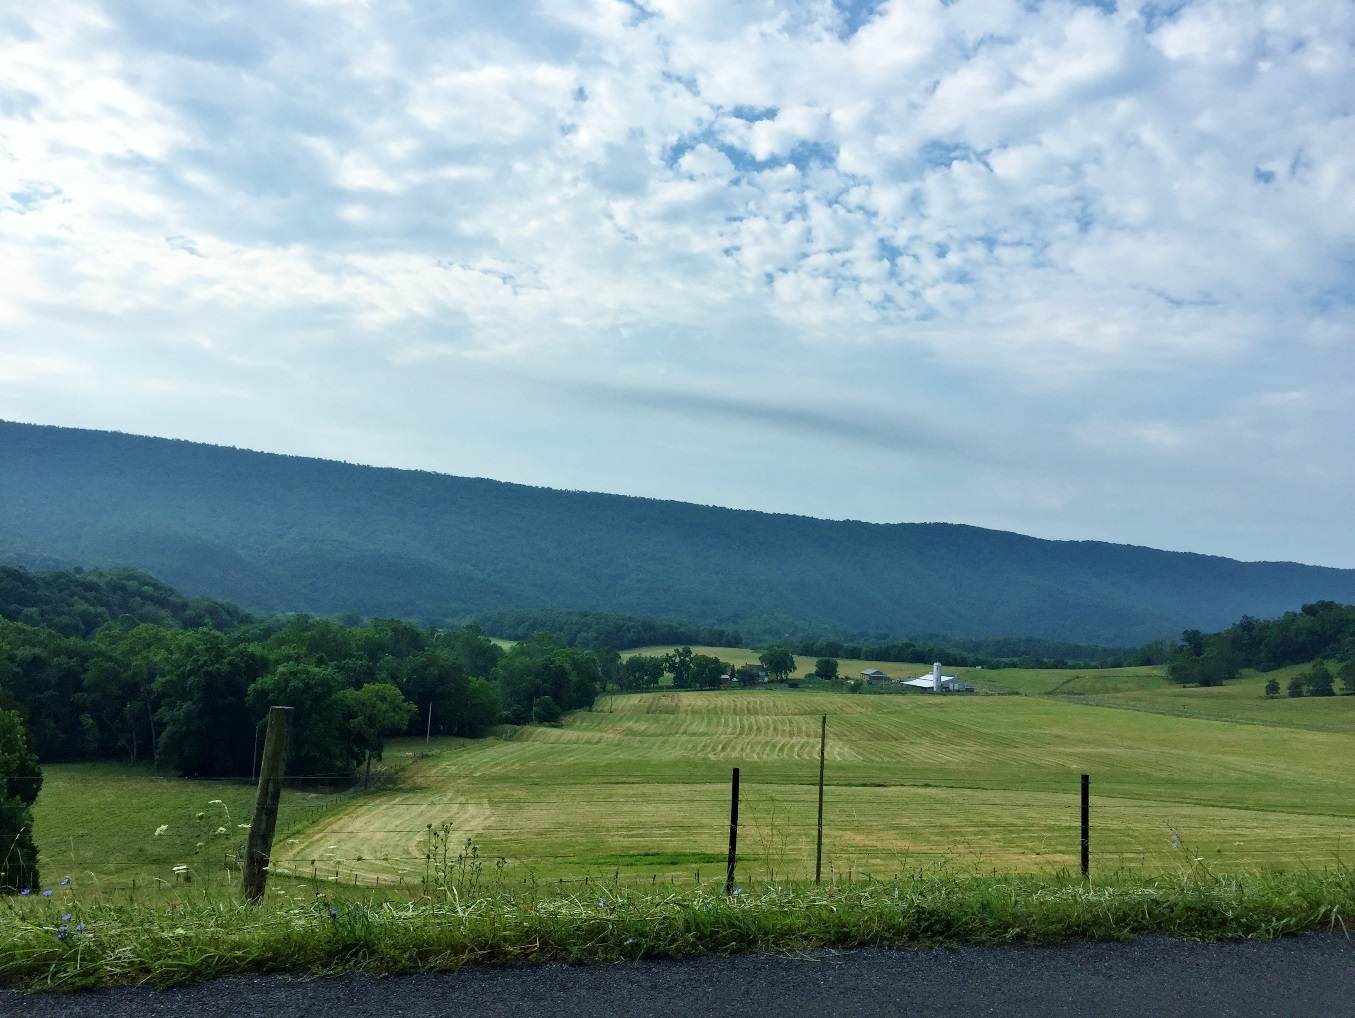 Private conservation easement & George Washington National Forest, Funk Road, Shenandoah County, Virginia. Emily Warner, 2016.